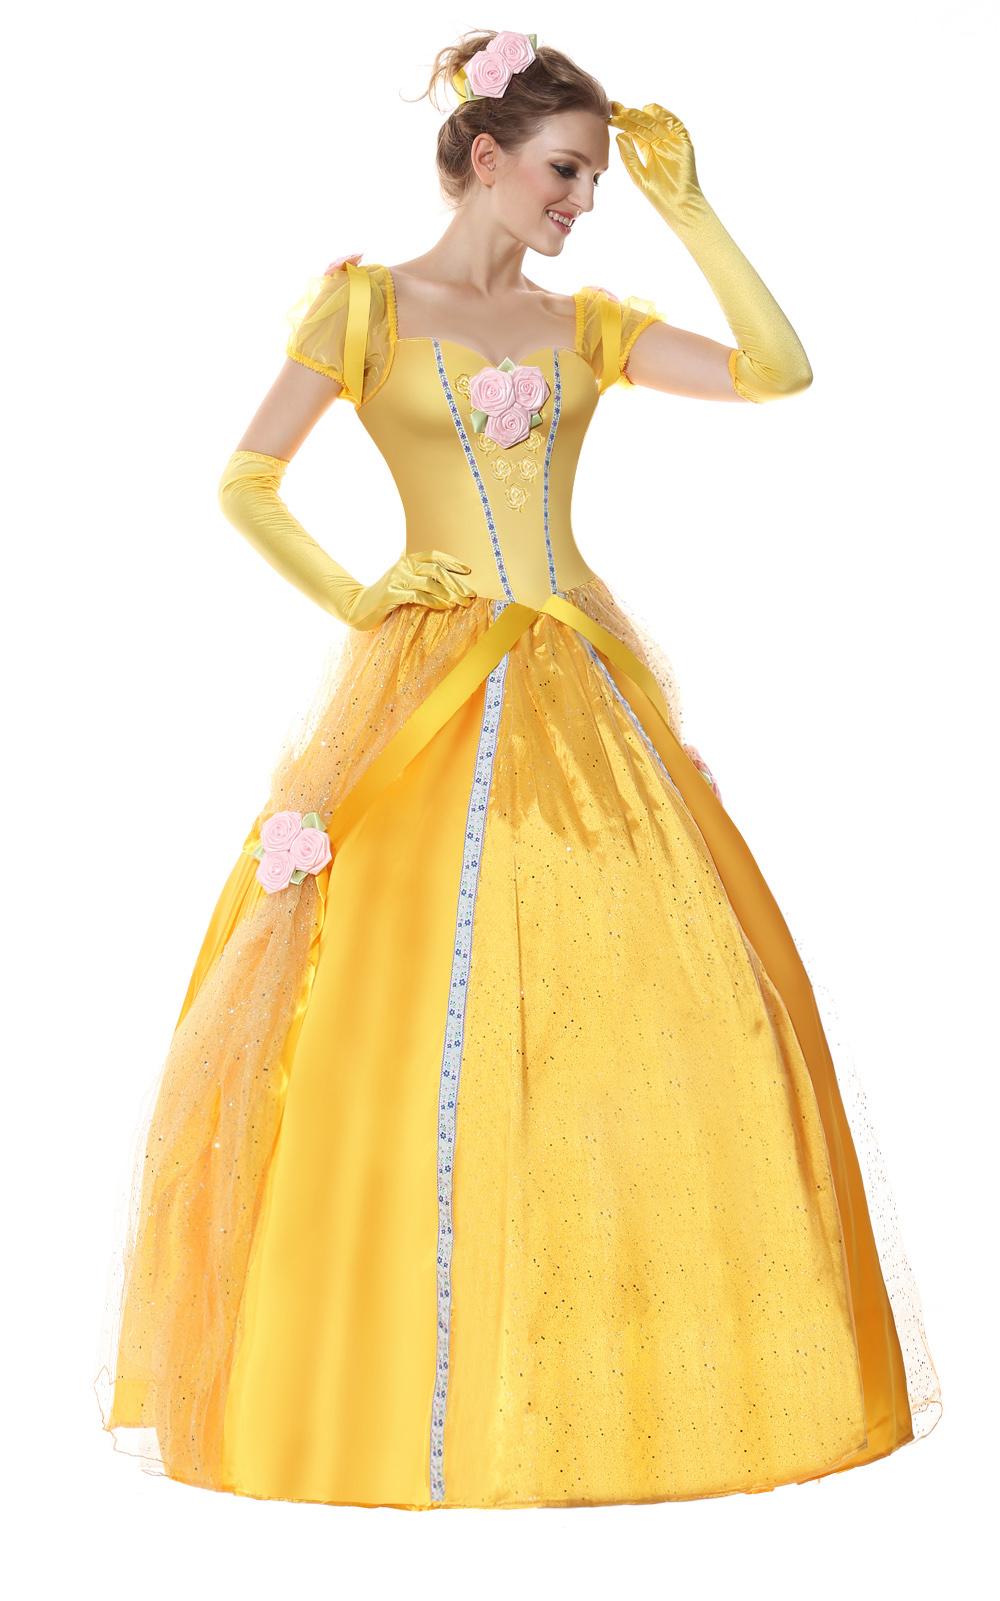 Newest Princess Dress Belle Yellow Dress Cosplay Princess Costume